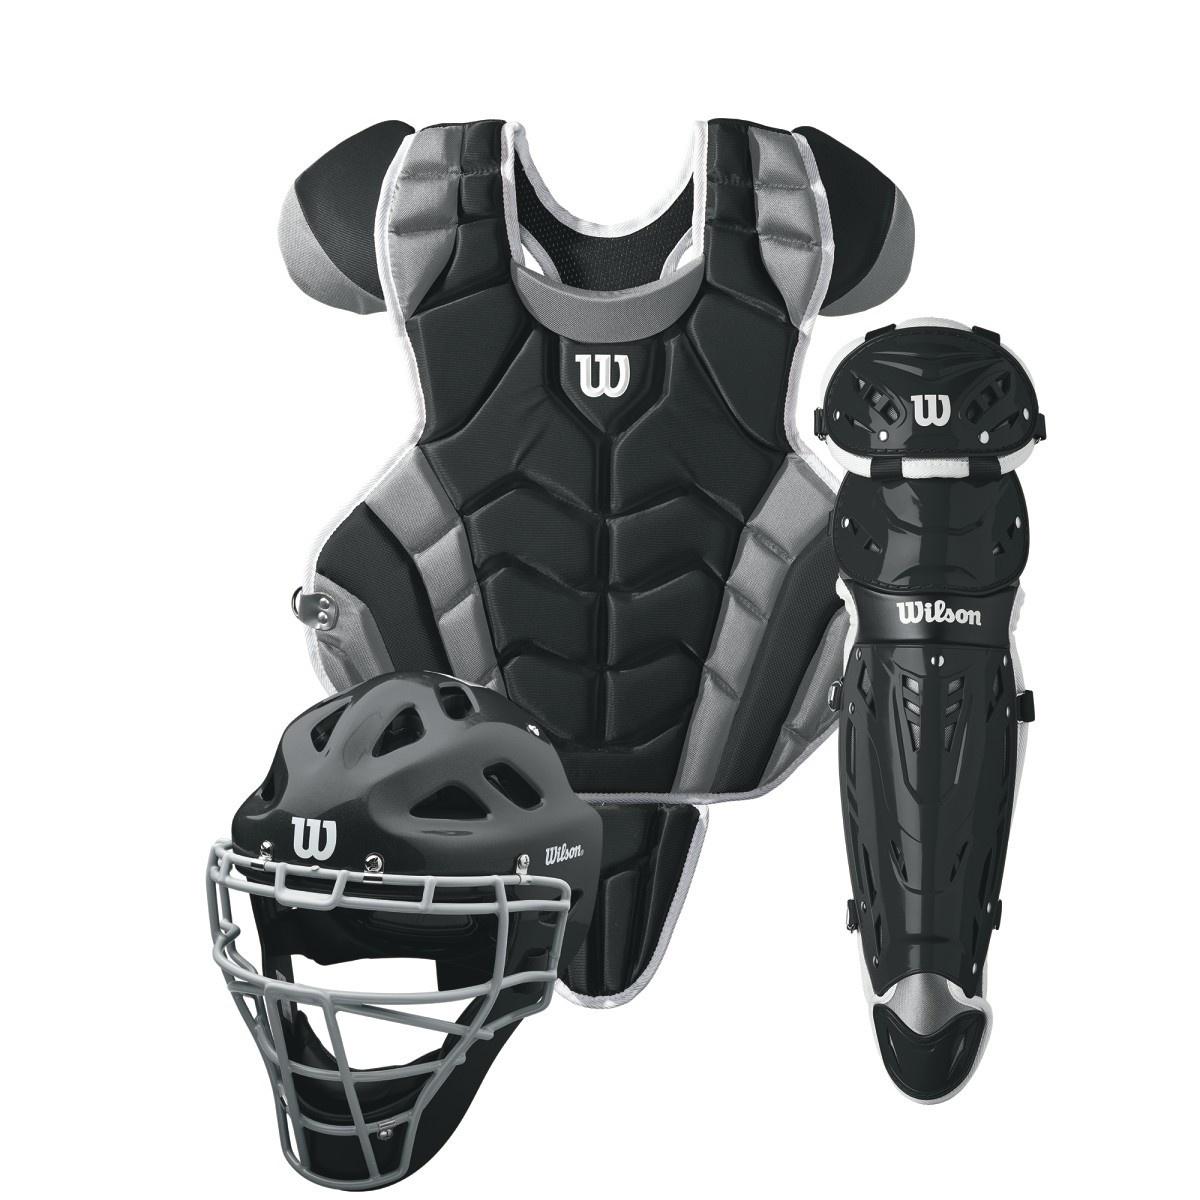 Wilson WILSON C1K Catcher's Gear Kit Int. - Black